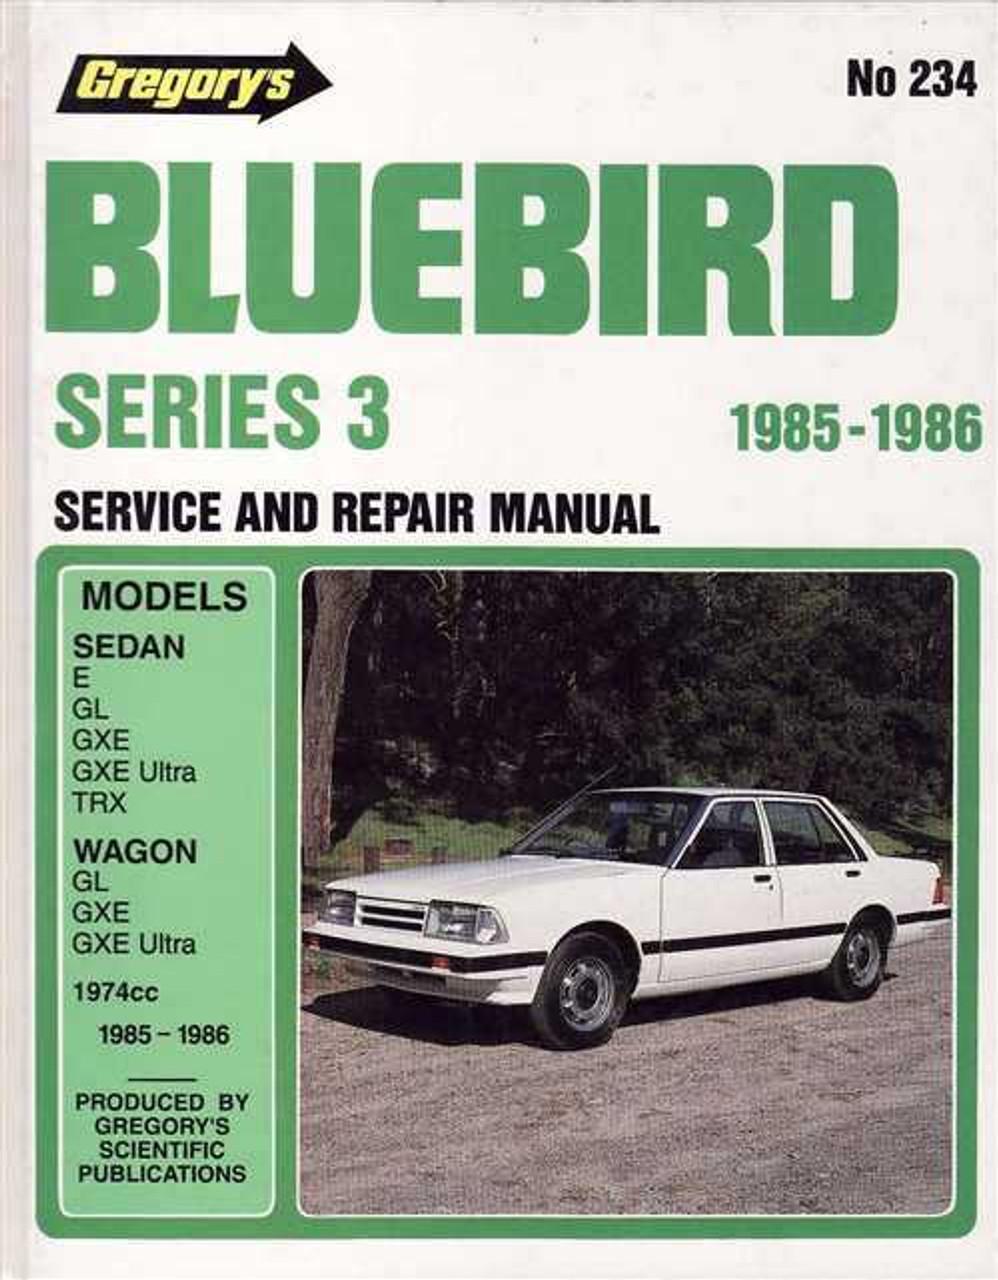 nissan bluebird series 3 1985 1986 workshop manual rh automotobookshop com au 1987 Nissan Bluebird 1992 Nissan Bluebird